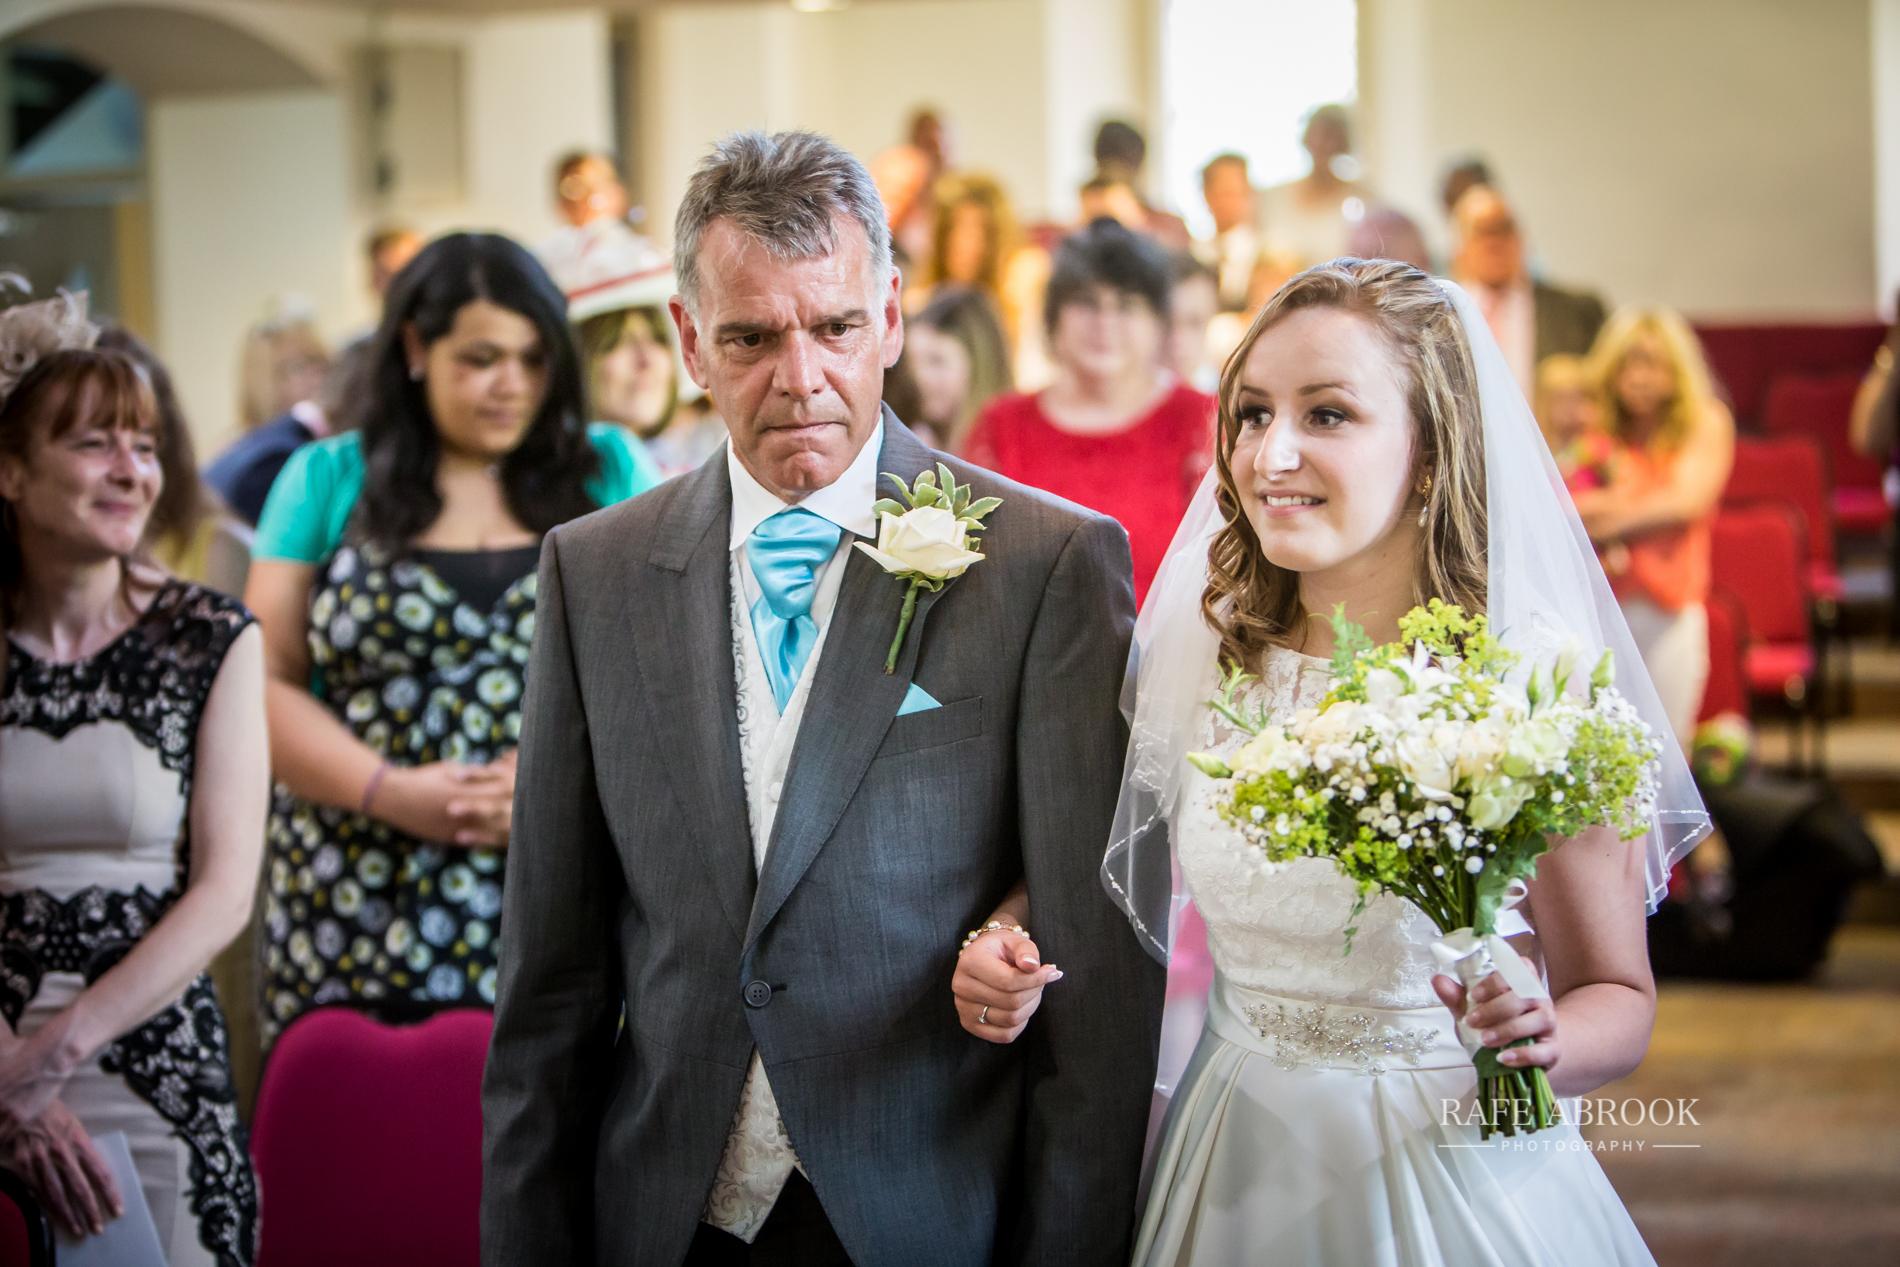 wedding photographer hertfordshire noke thistle hotel st albans -1108.jpg